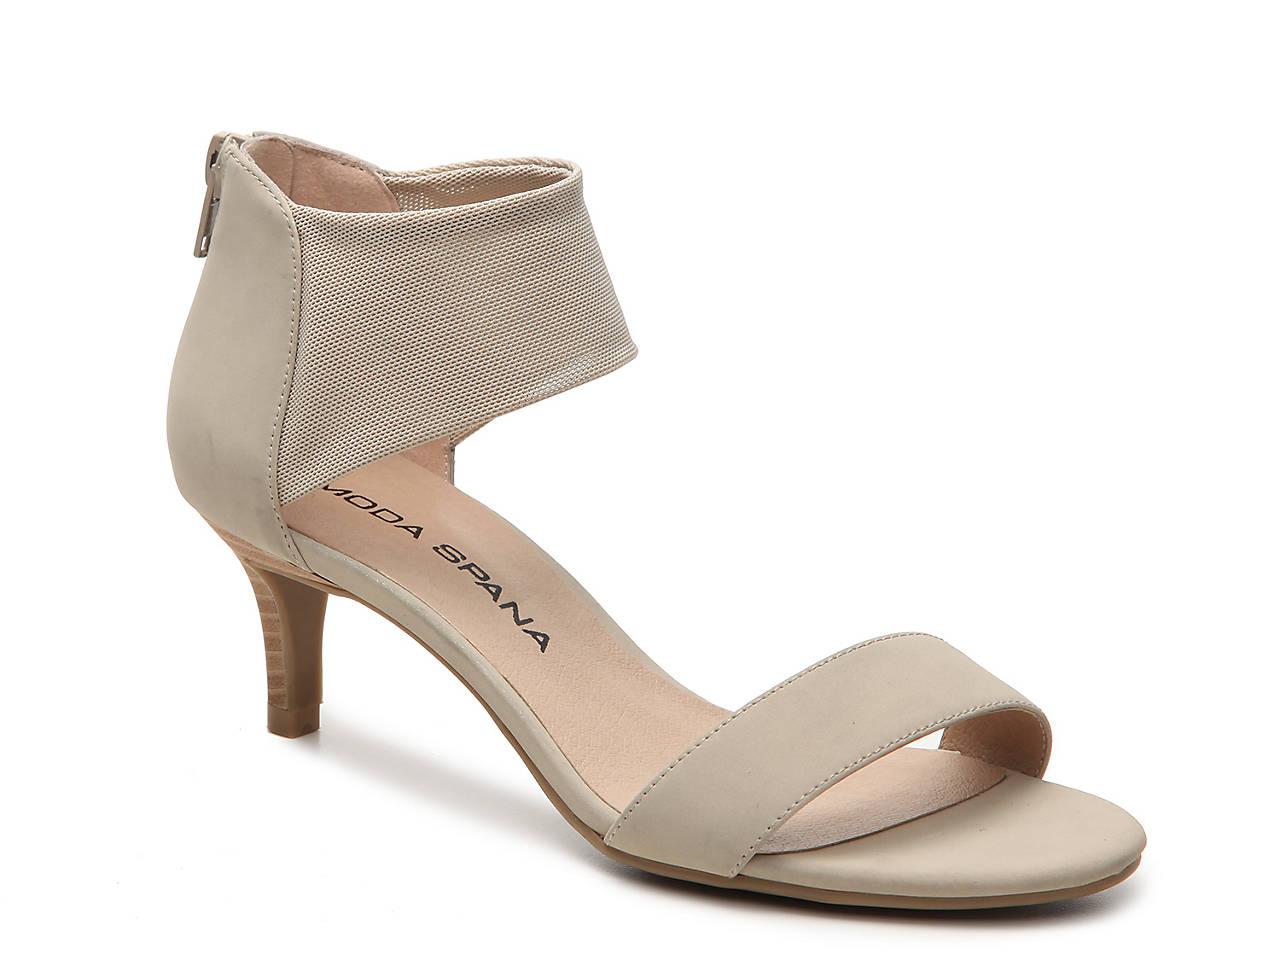 d5bebac1d Moda Spana Meg Sandal Women s Shoes